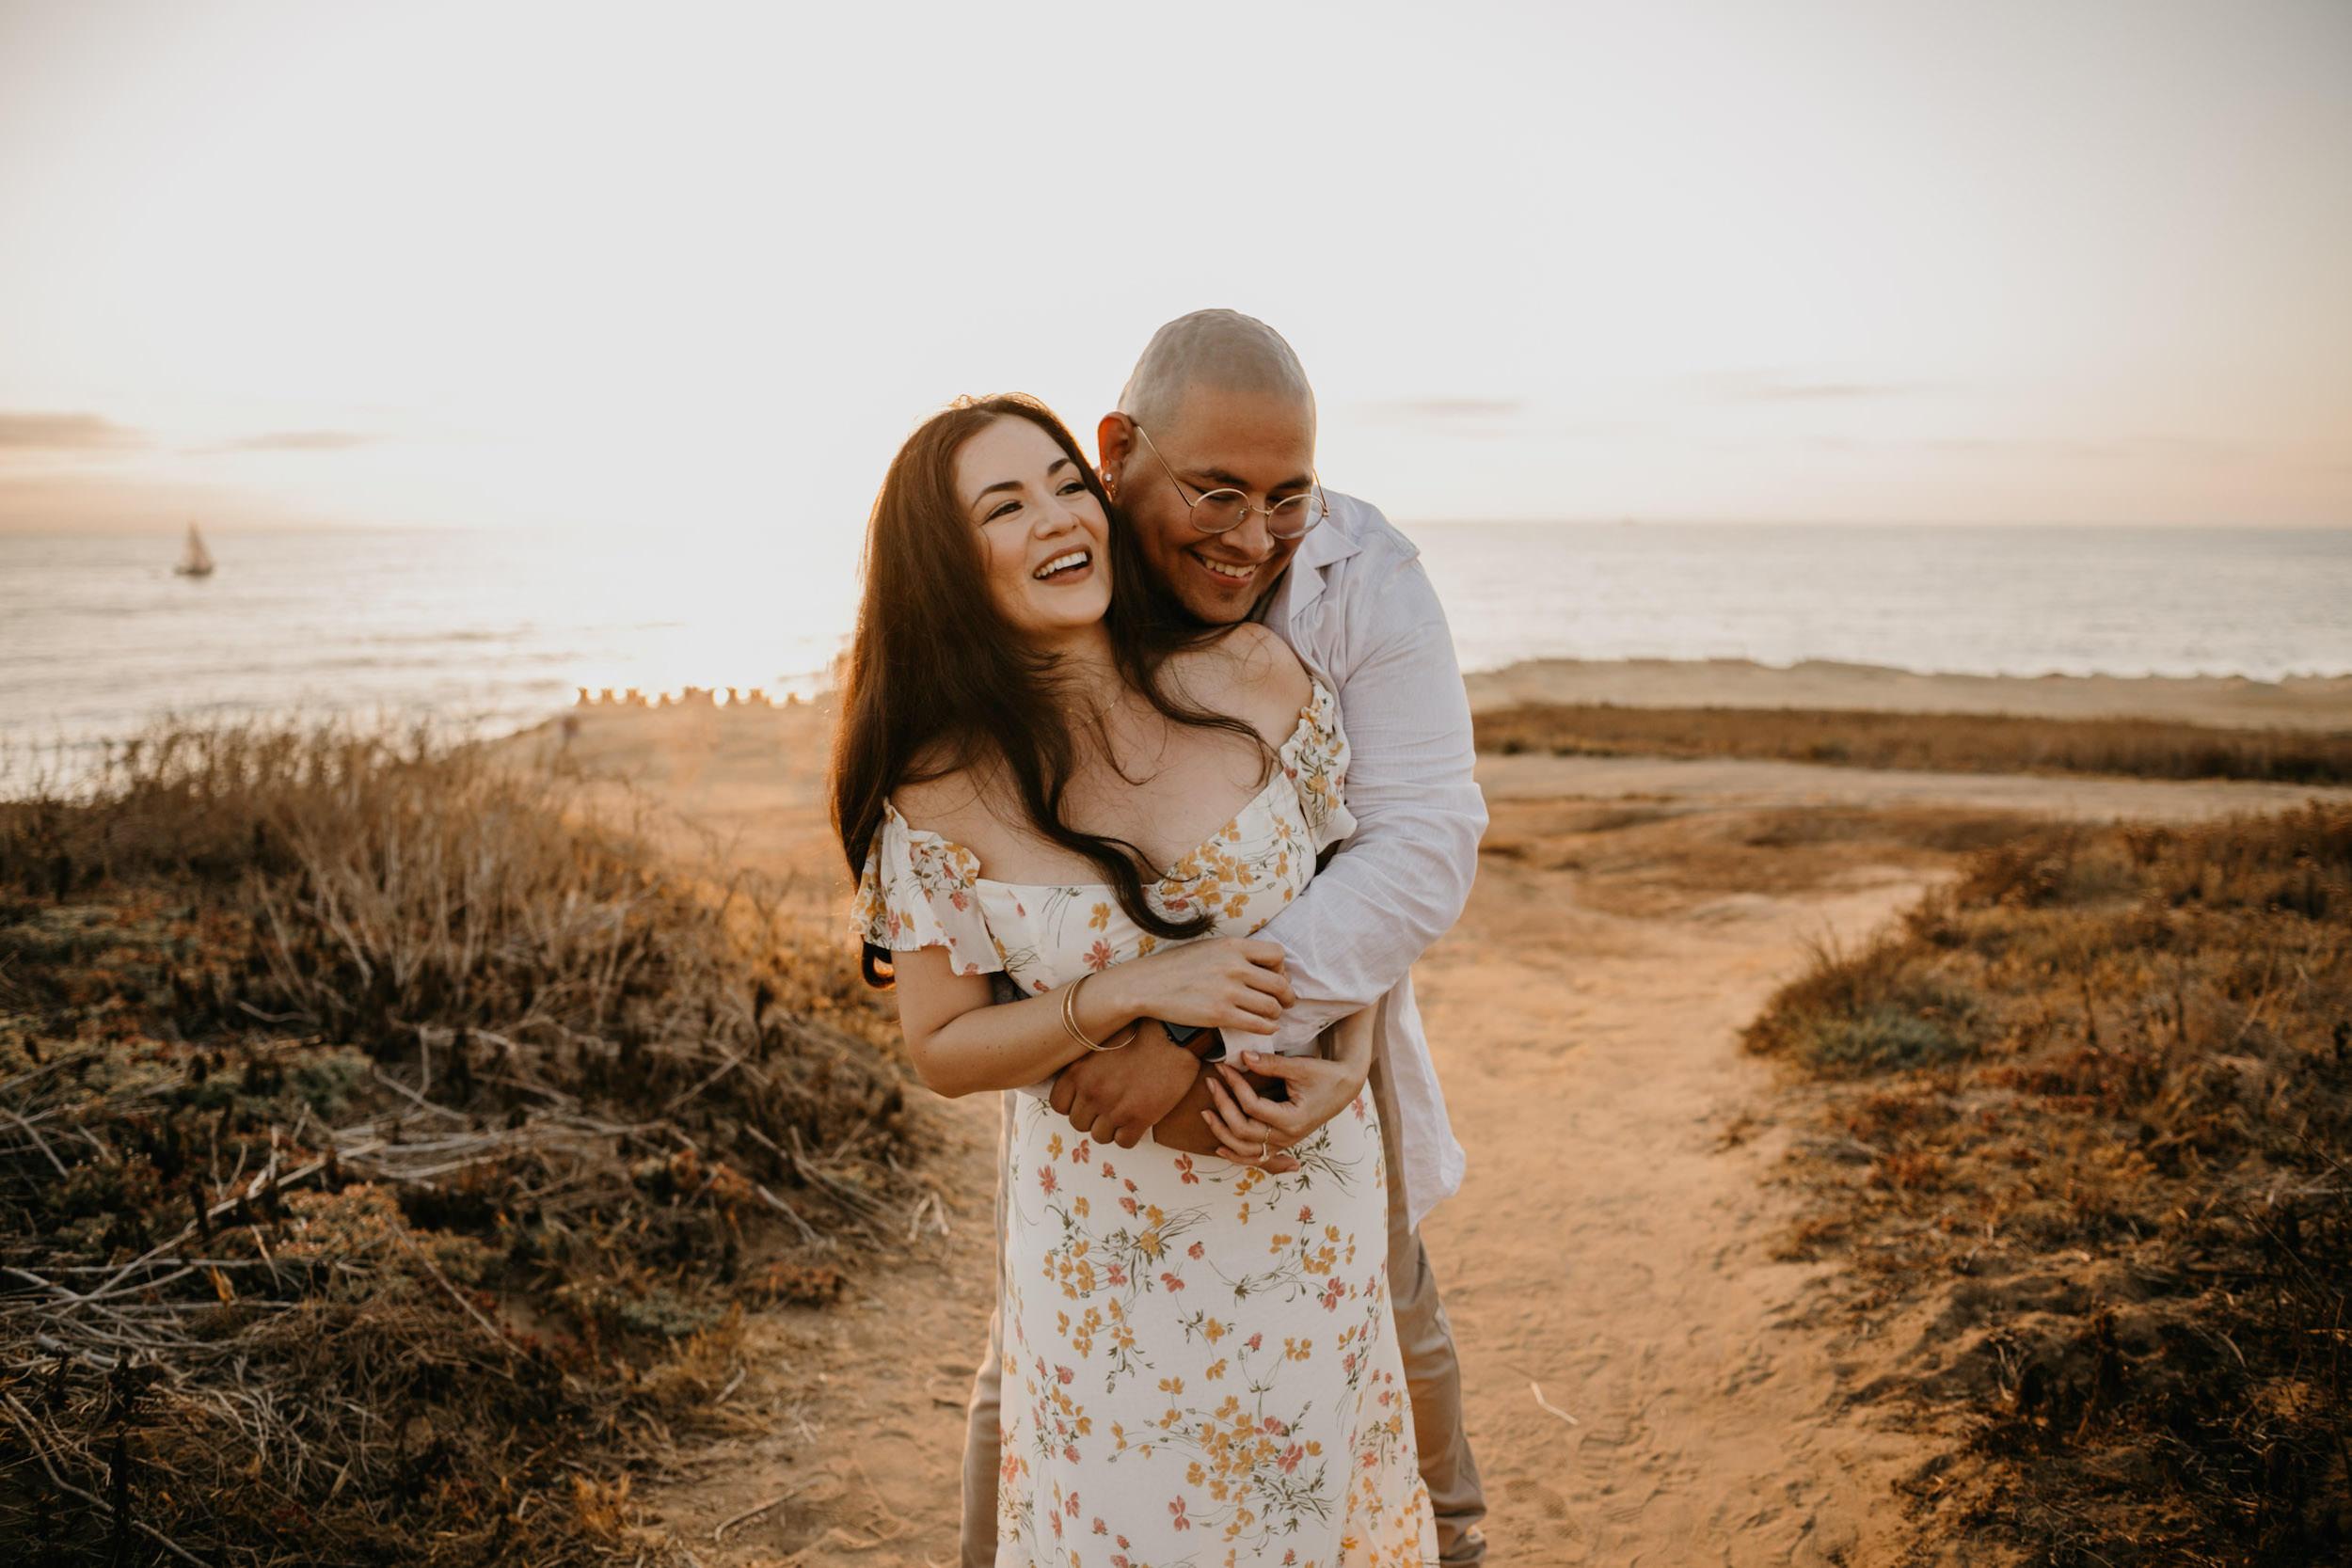 Sunset Cliffs Surprise Proposal in San Diego, image by Fatima Elreda Photo